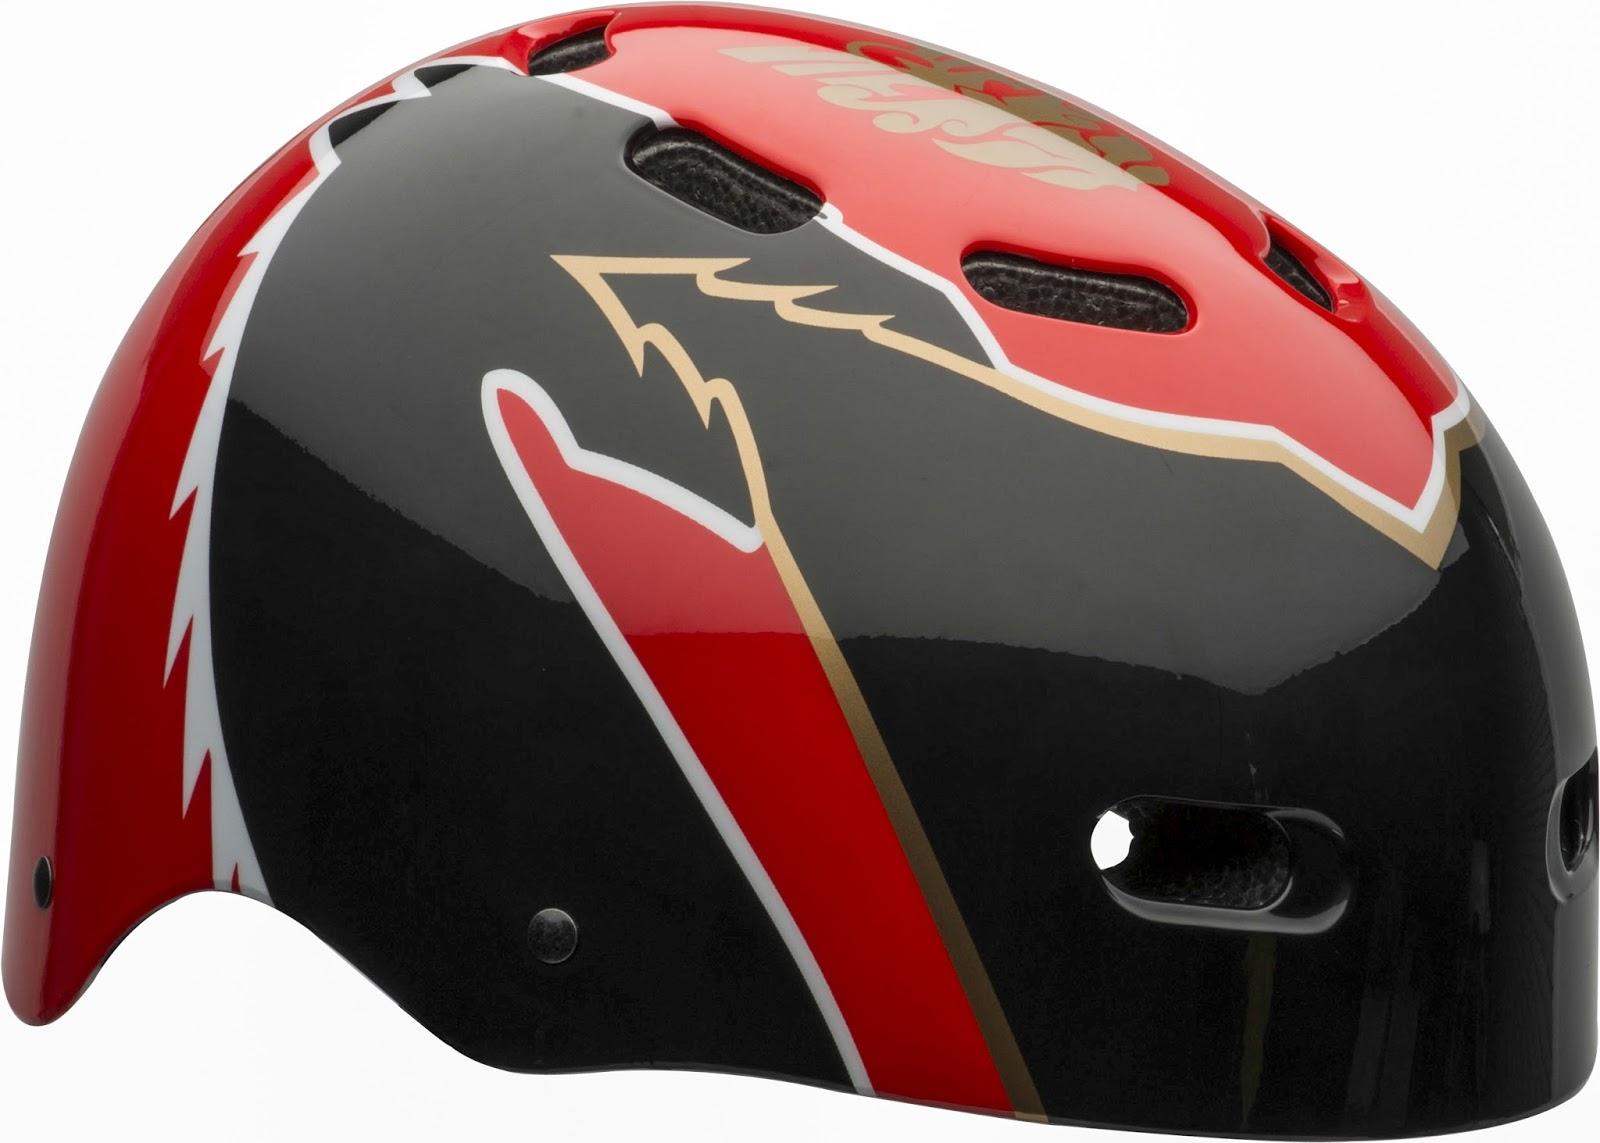 How my son built confidence power rangers megaforce scooter helmet snymed - Moto power rangers megaforce ...